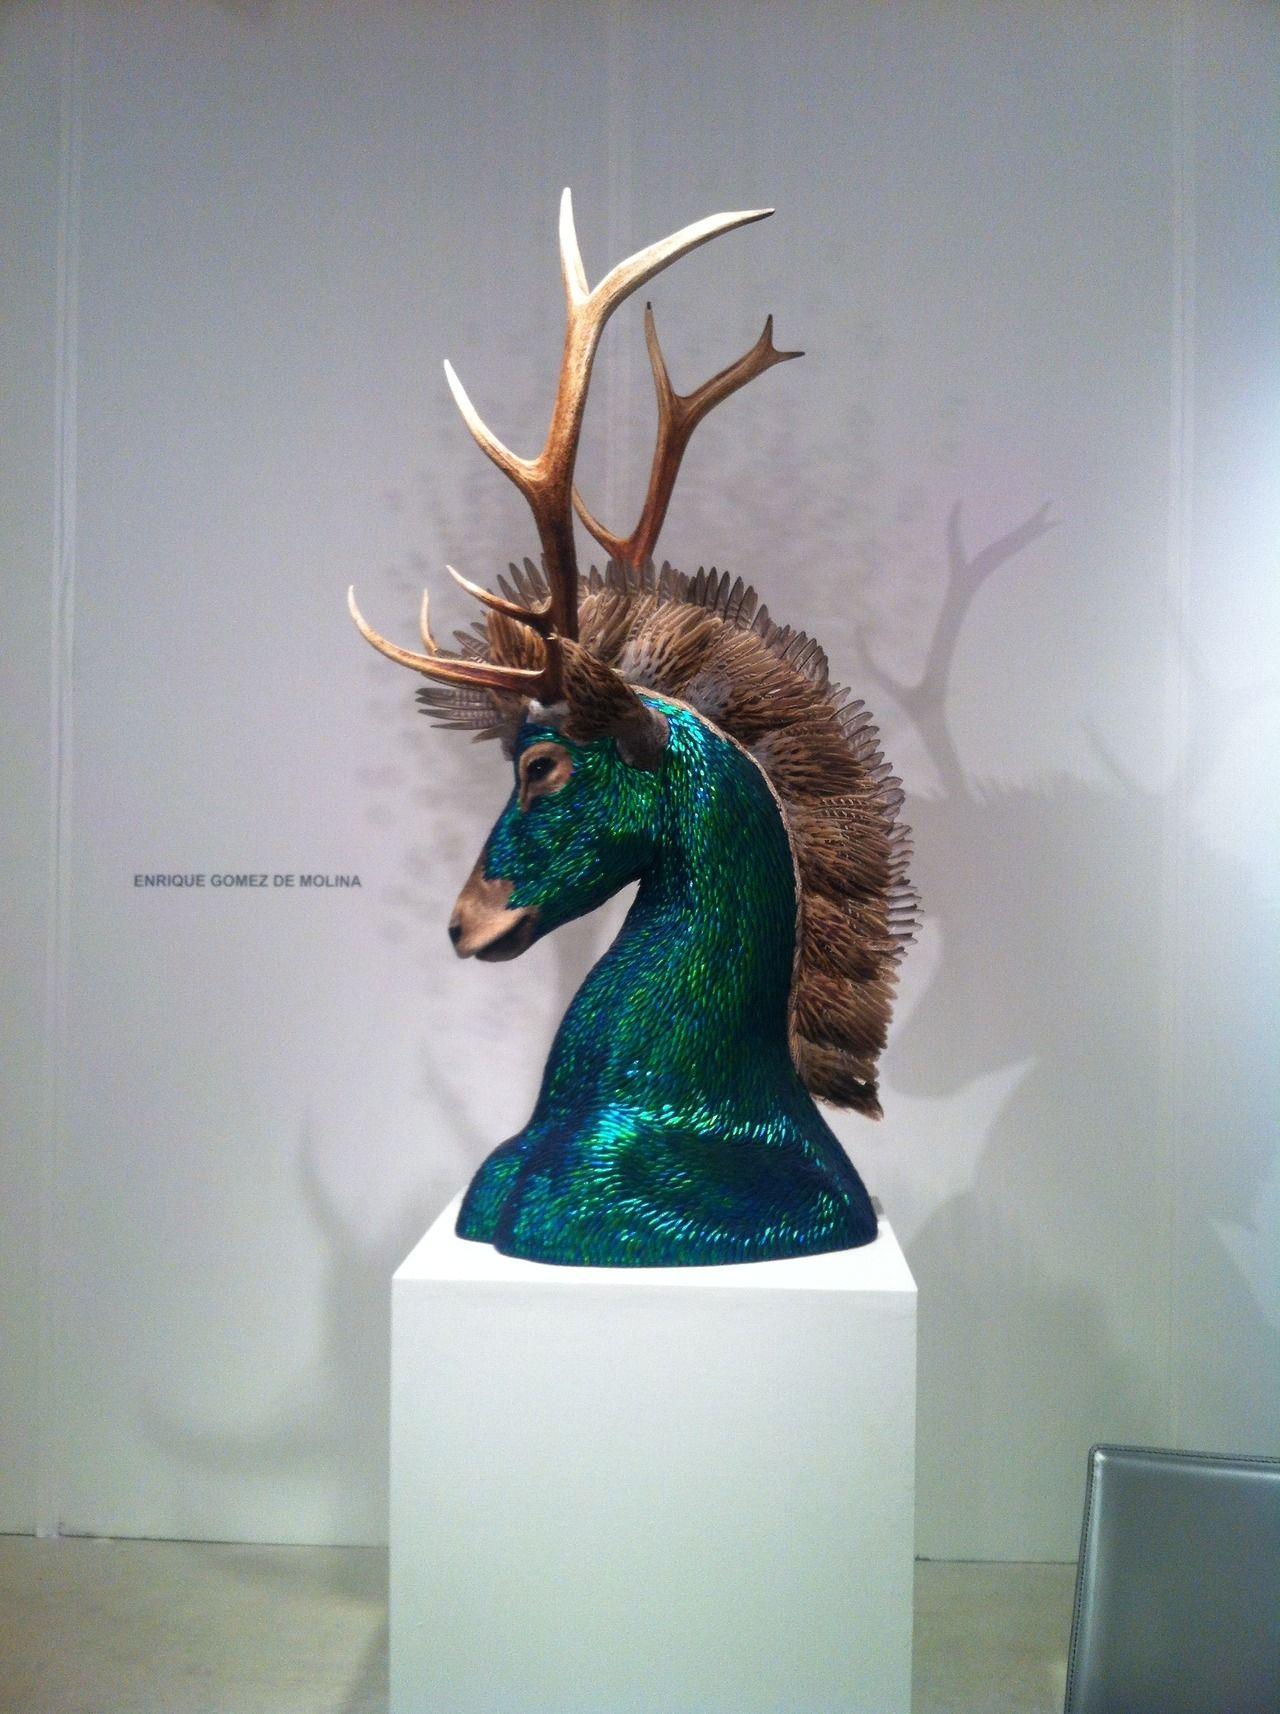 Enrique Gomez De Molina Sculpture art, Crafts, Taxidermy